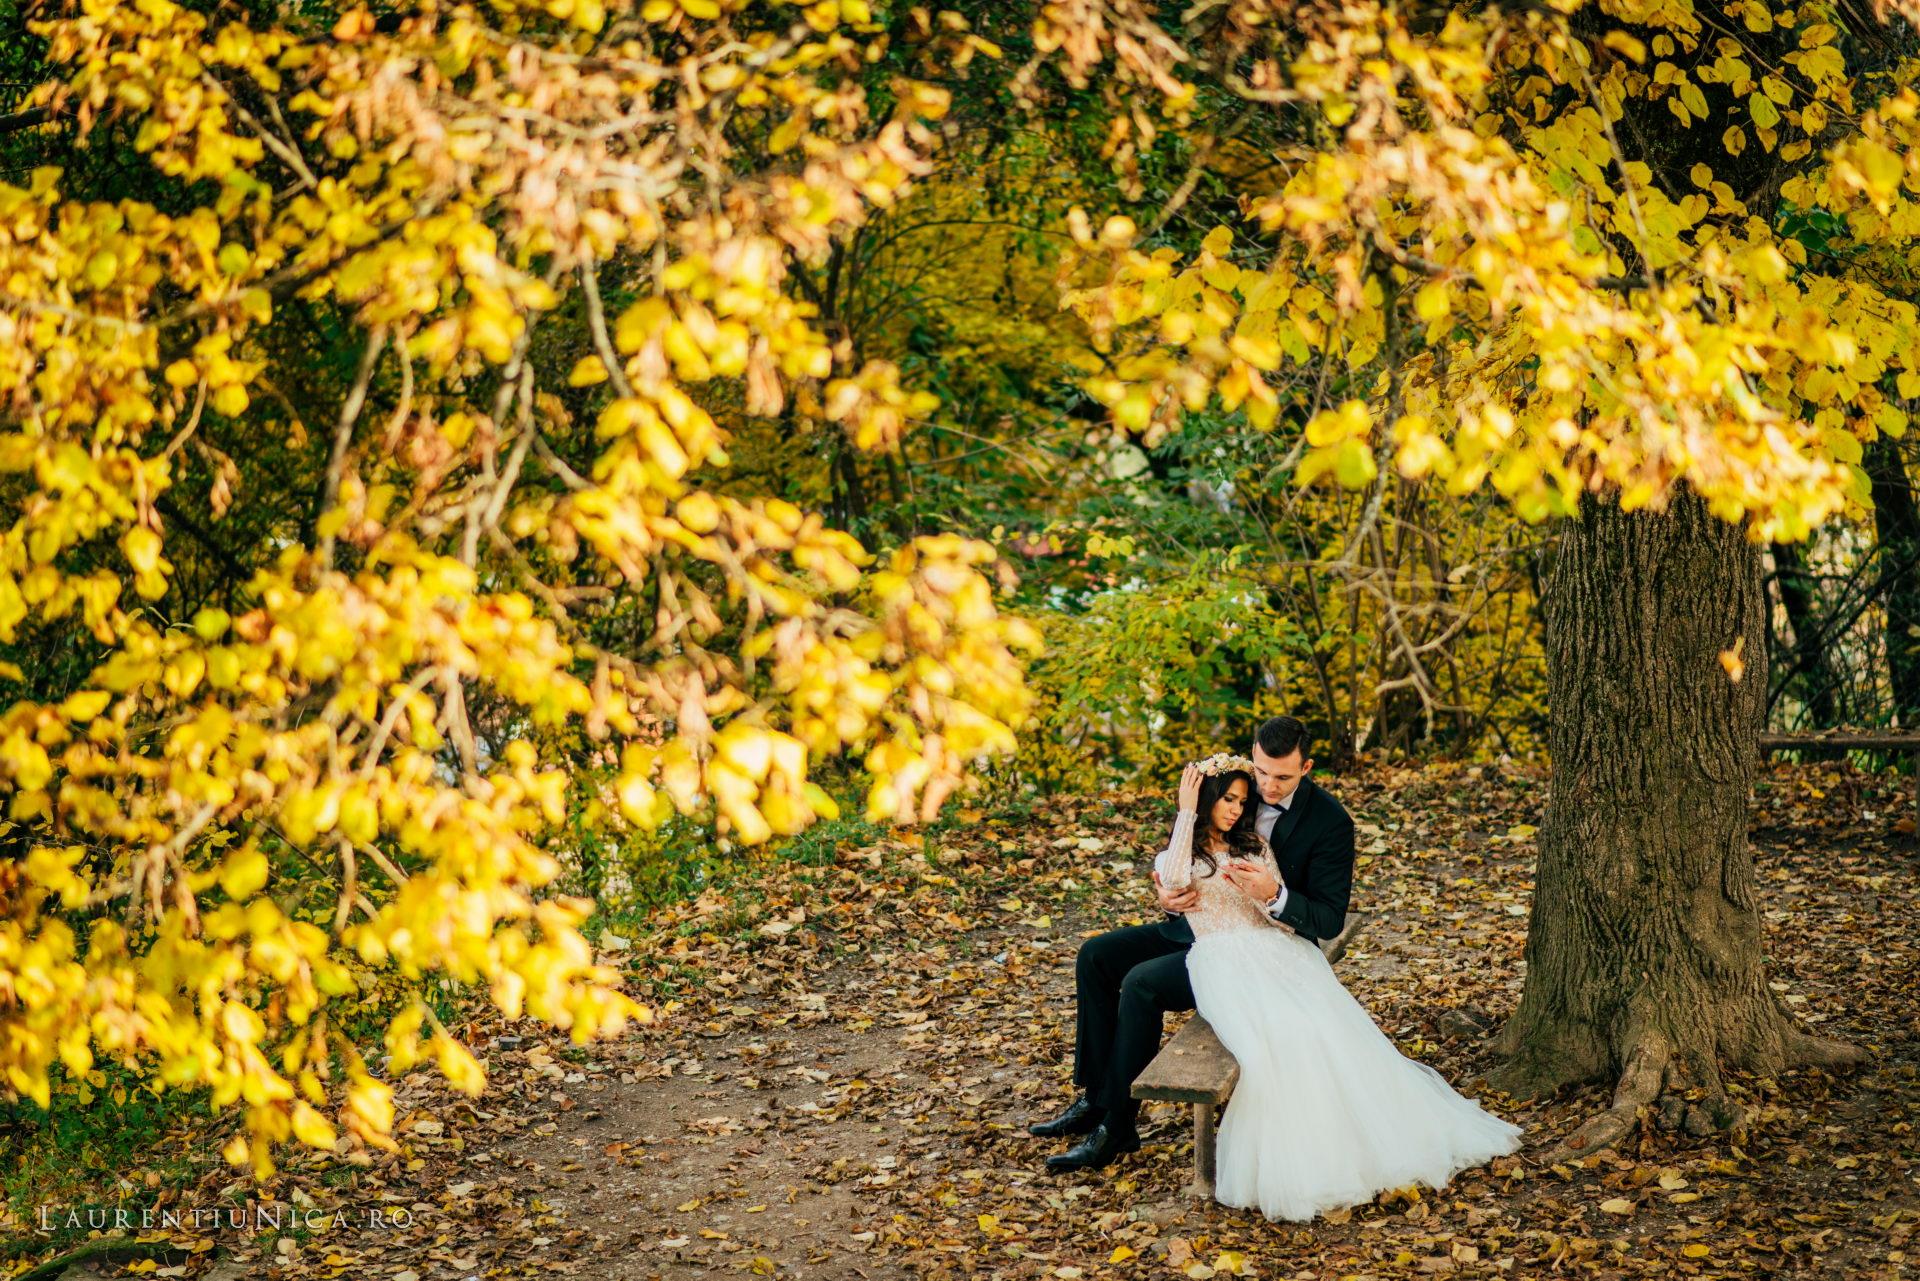 lili-si-dan-fotografii-nunta-after-wedding-sighisoara-laurentiu-nica27